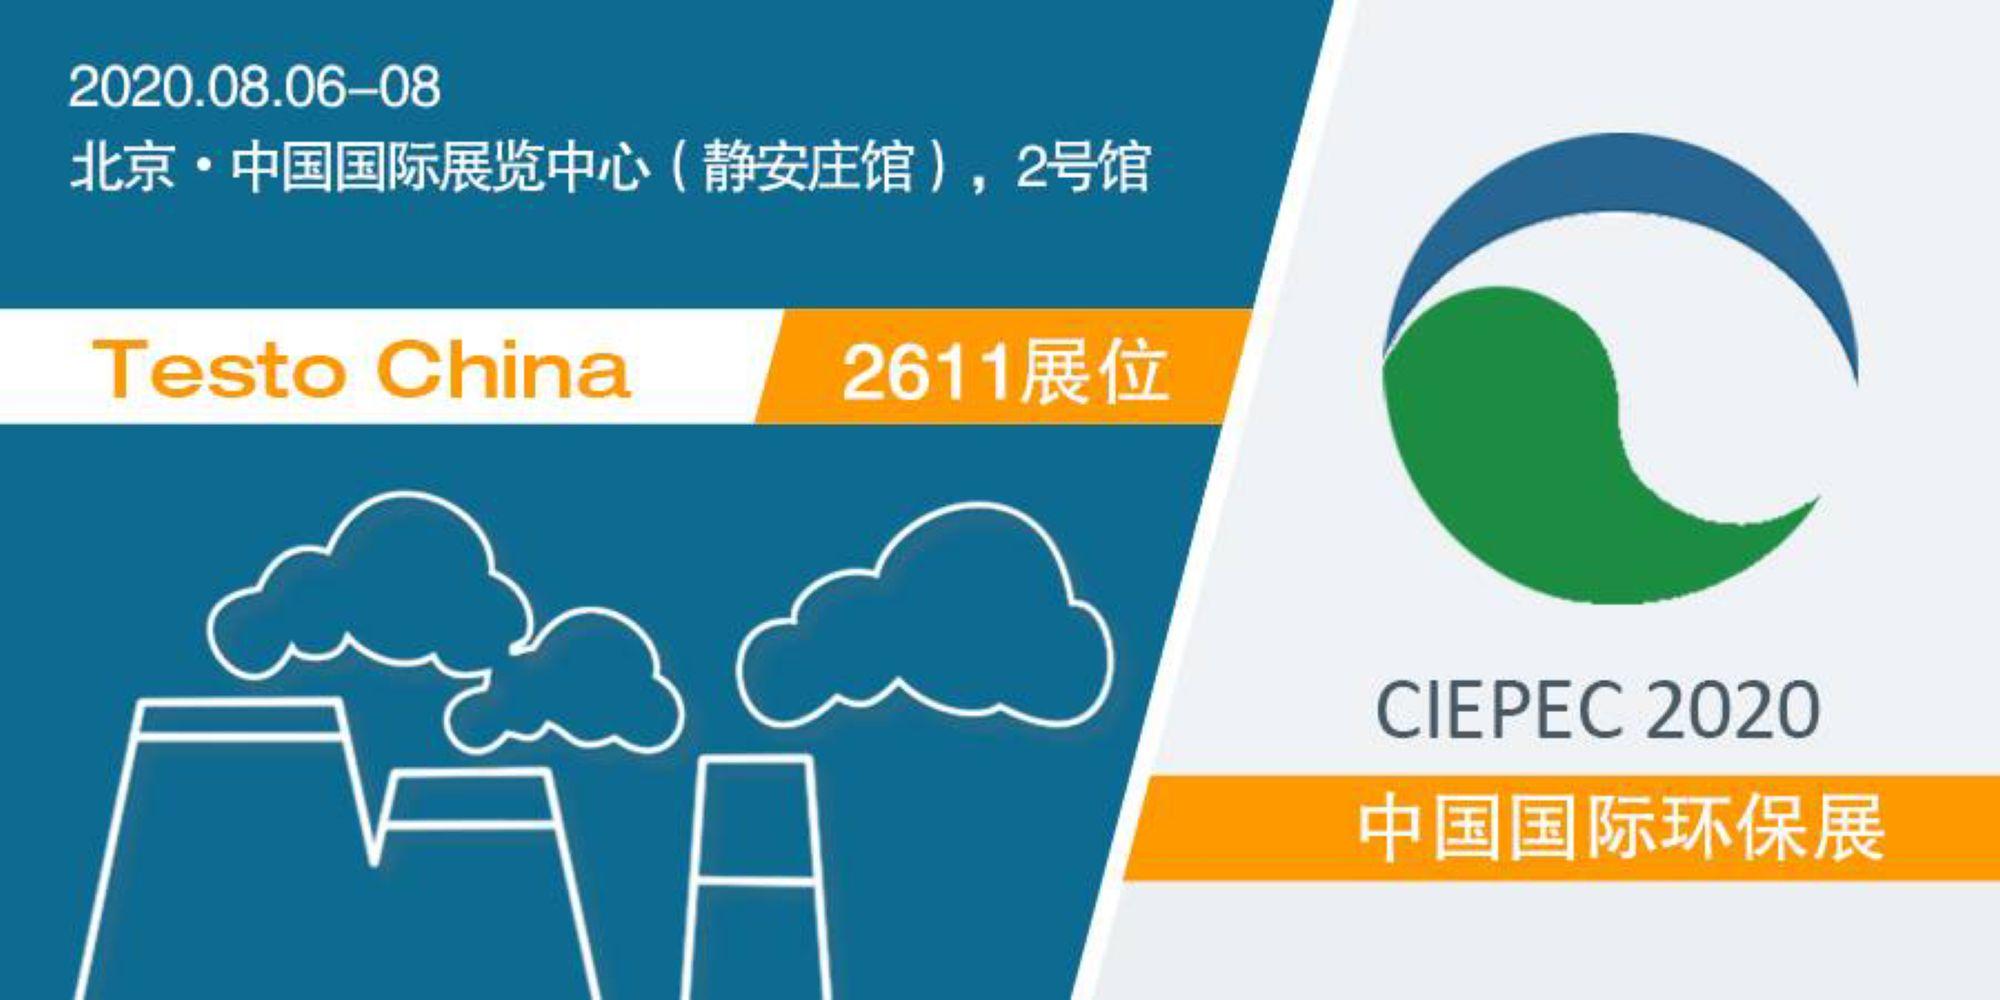 CN-GI-Testo-CIEPEC2020-invite-banner-900x450.jpg